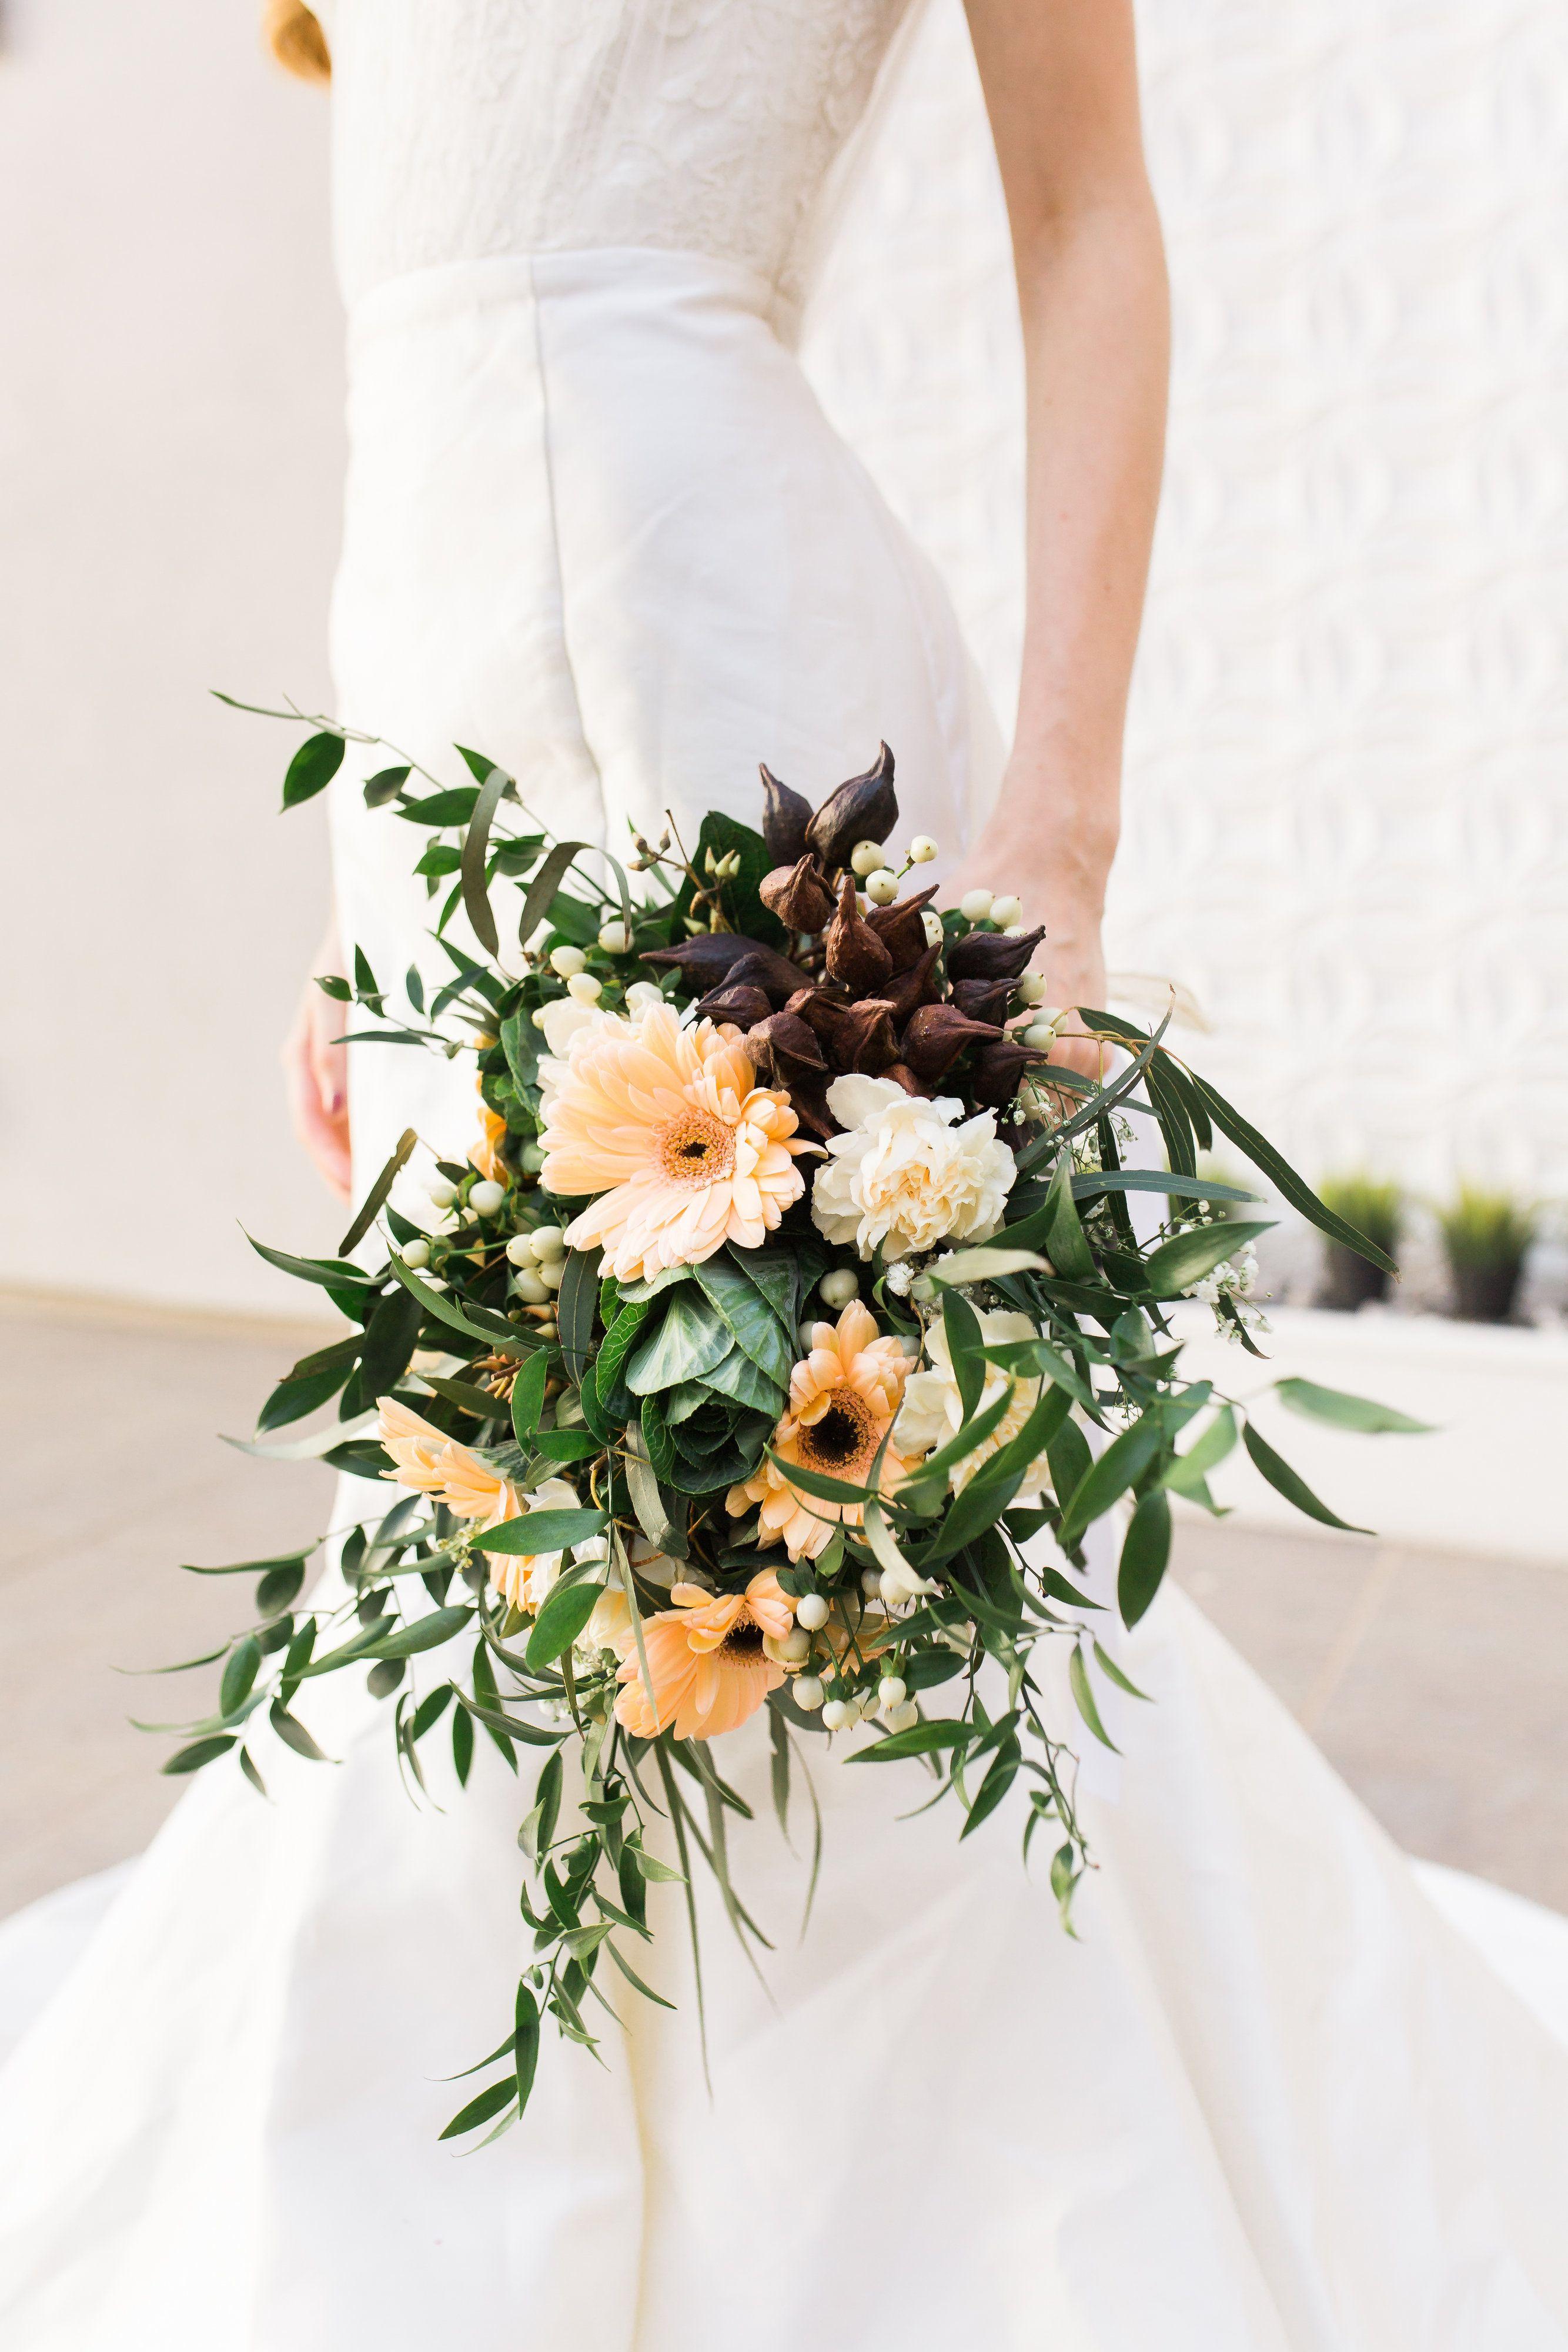 Gerbera Daisies Gerbs Daisies Bridal Bouquet Wedding Flowers